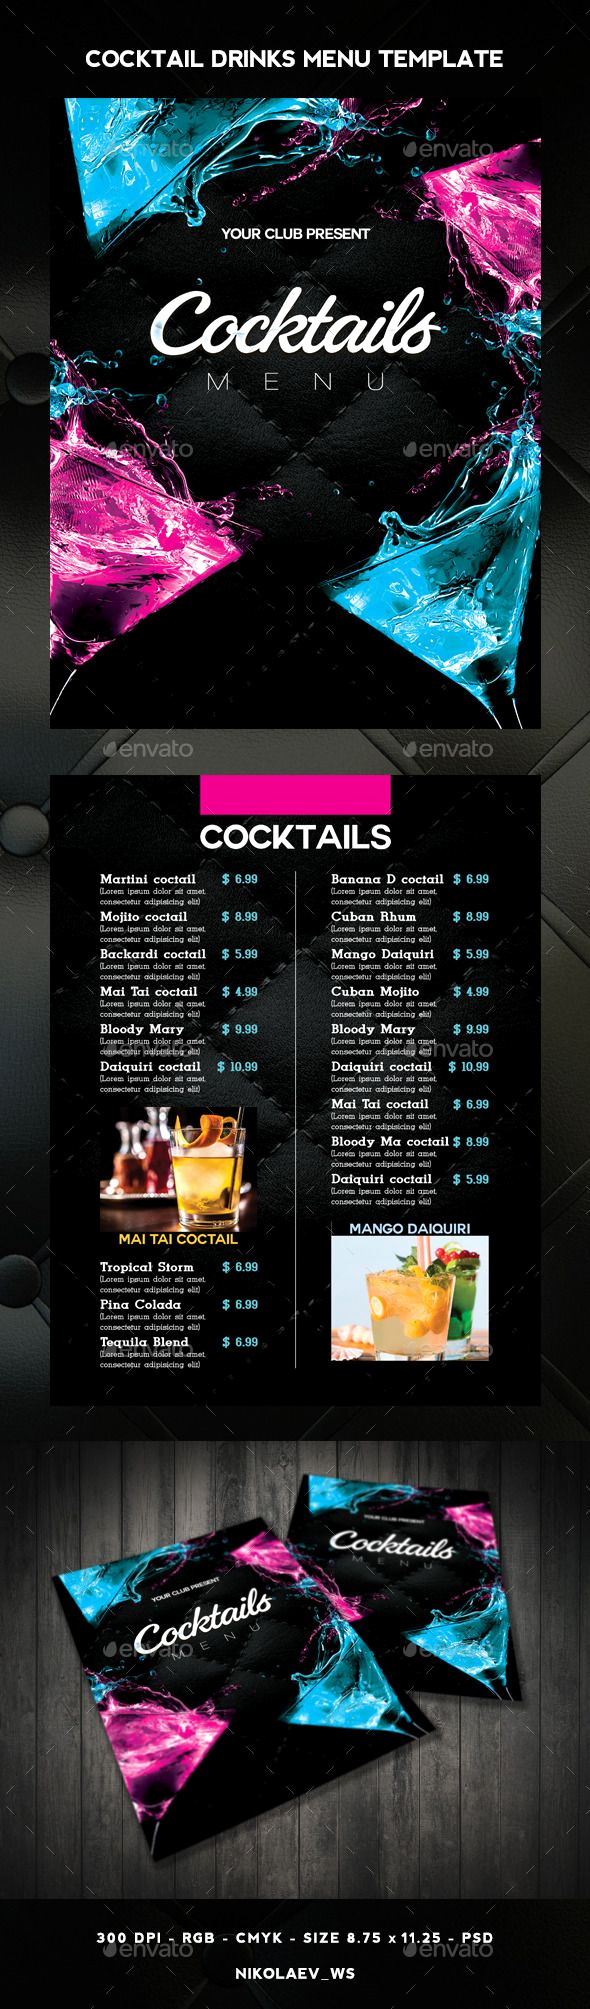 Cocktail Menu Template Free Inspirational Cocktail Drinks Menu